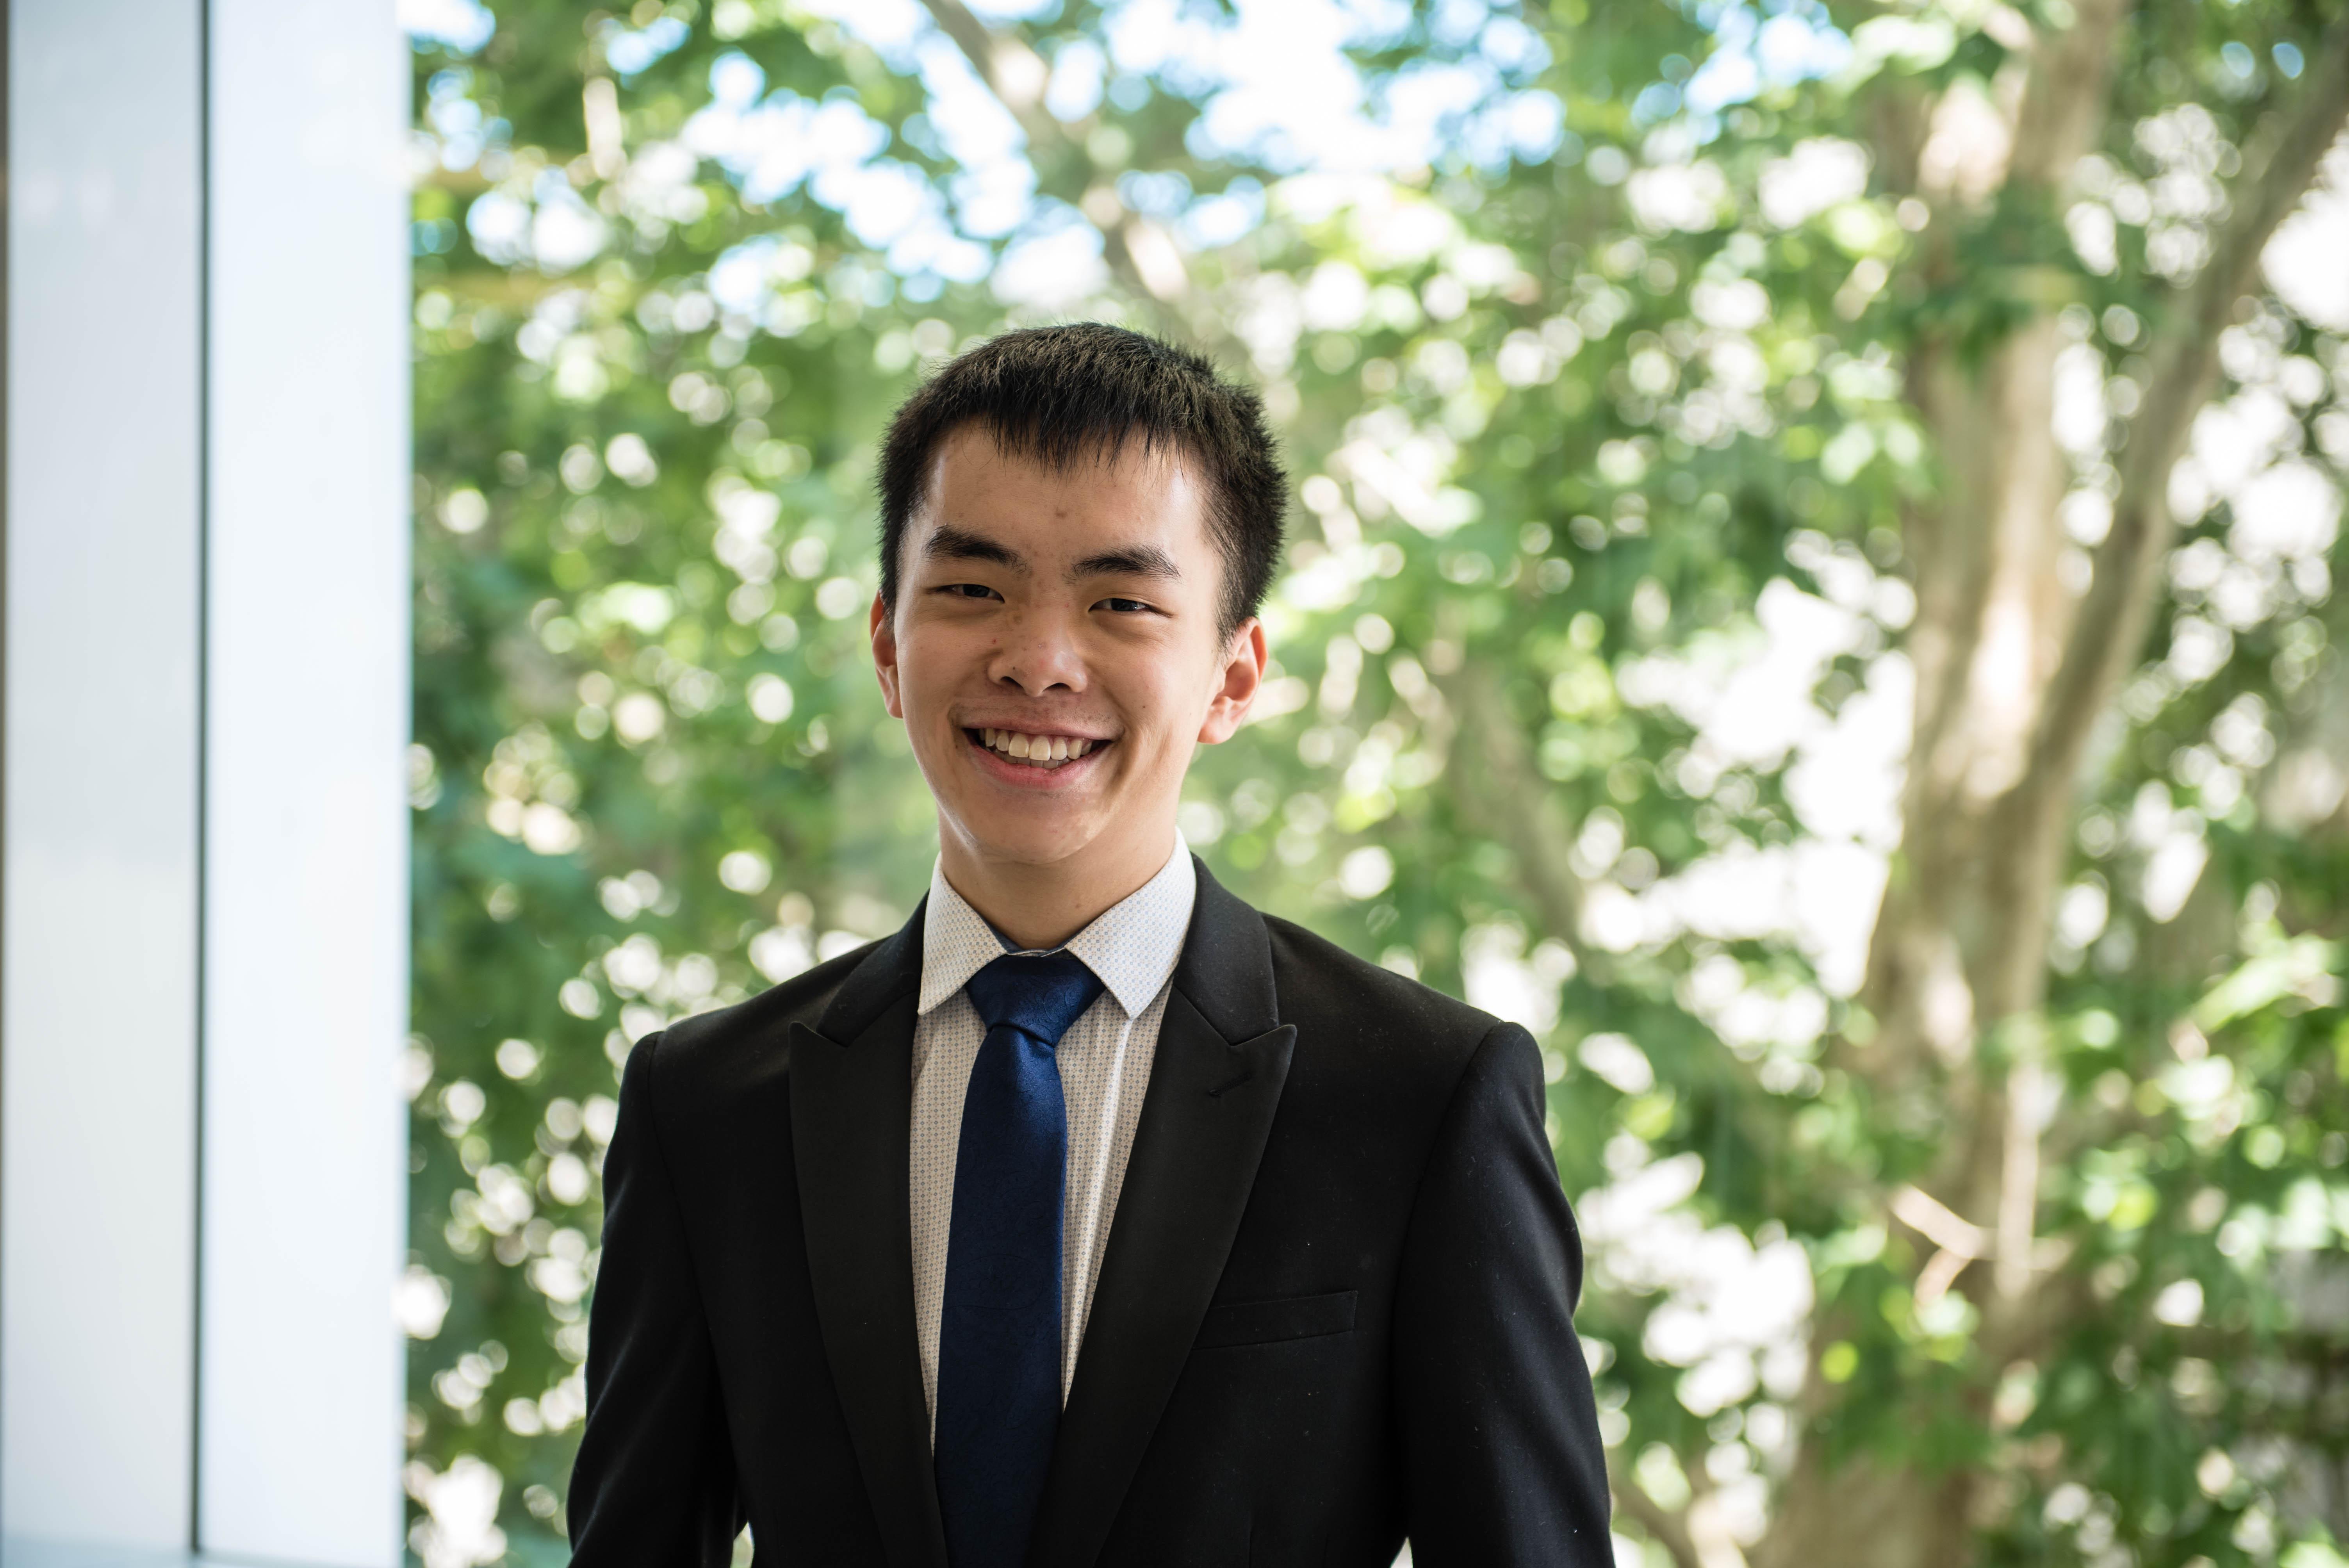 Patrick Wan